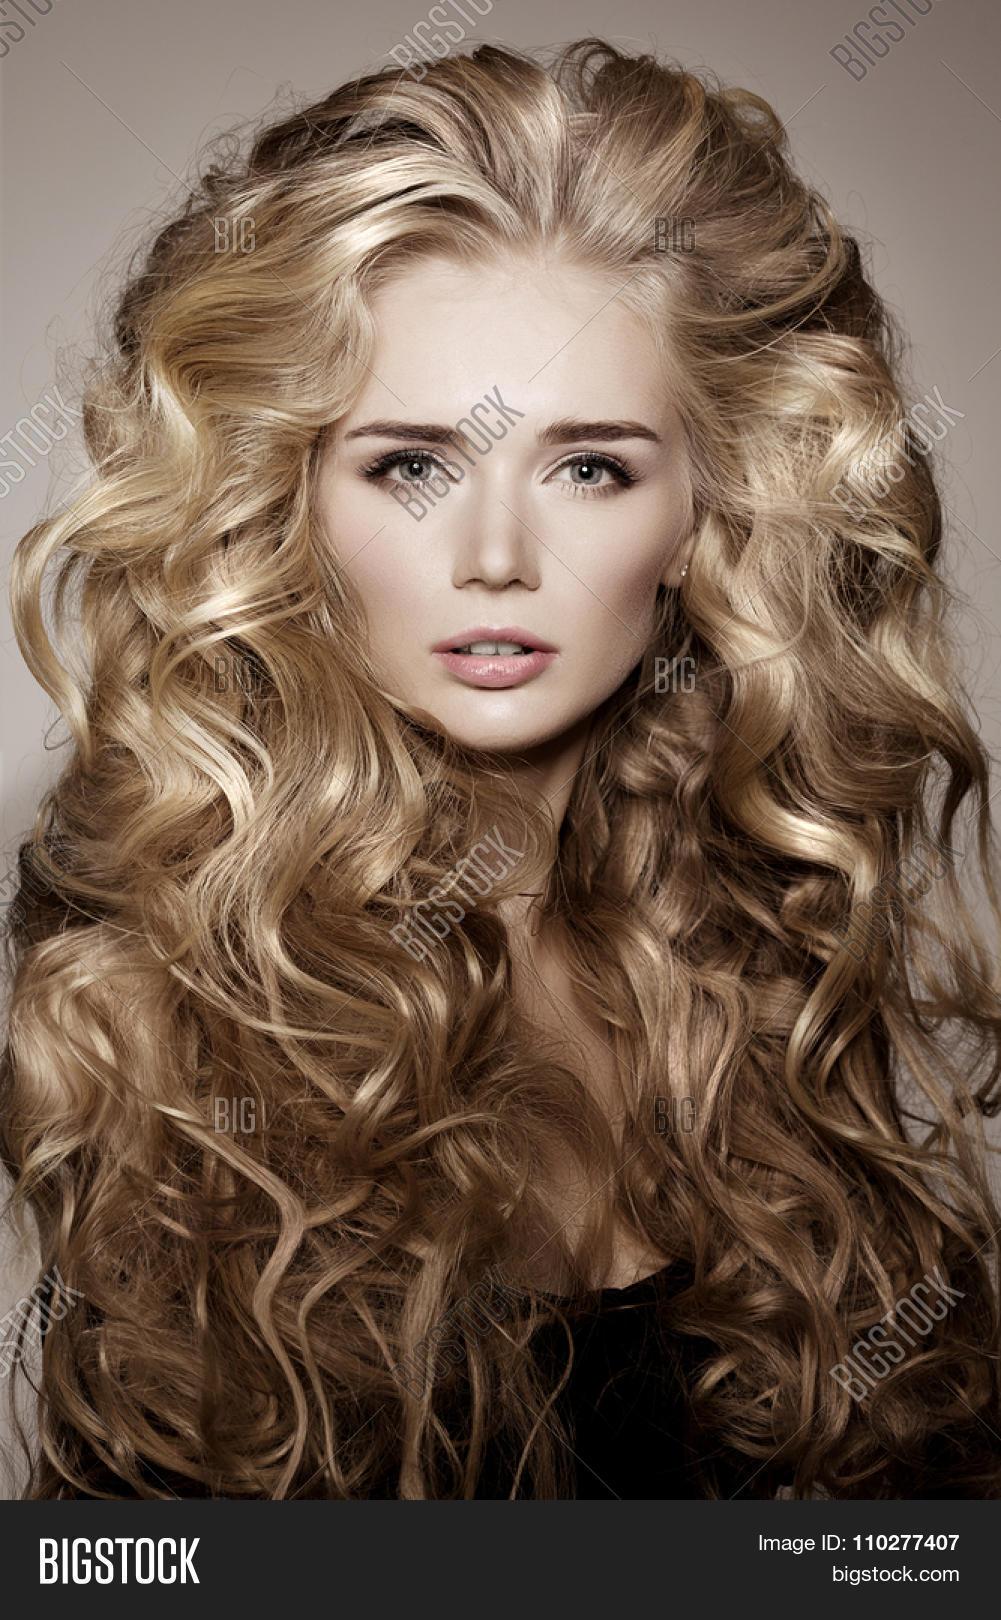 Model Blonde Long Hair Waves Curls Image Photo Bigstock - Haircut girl model